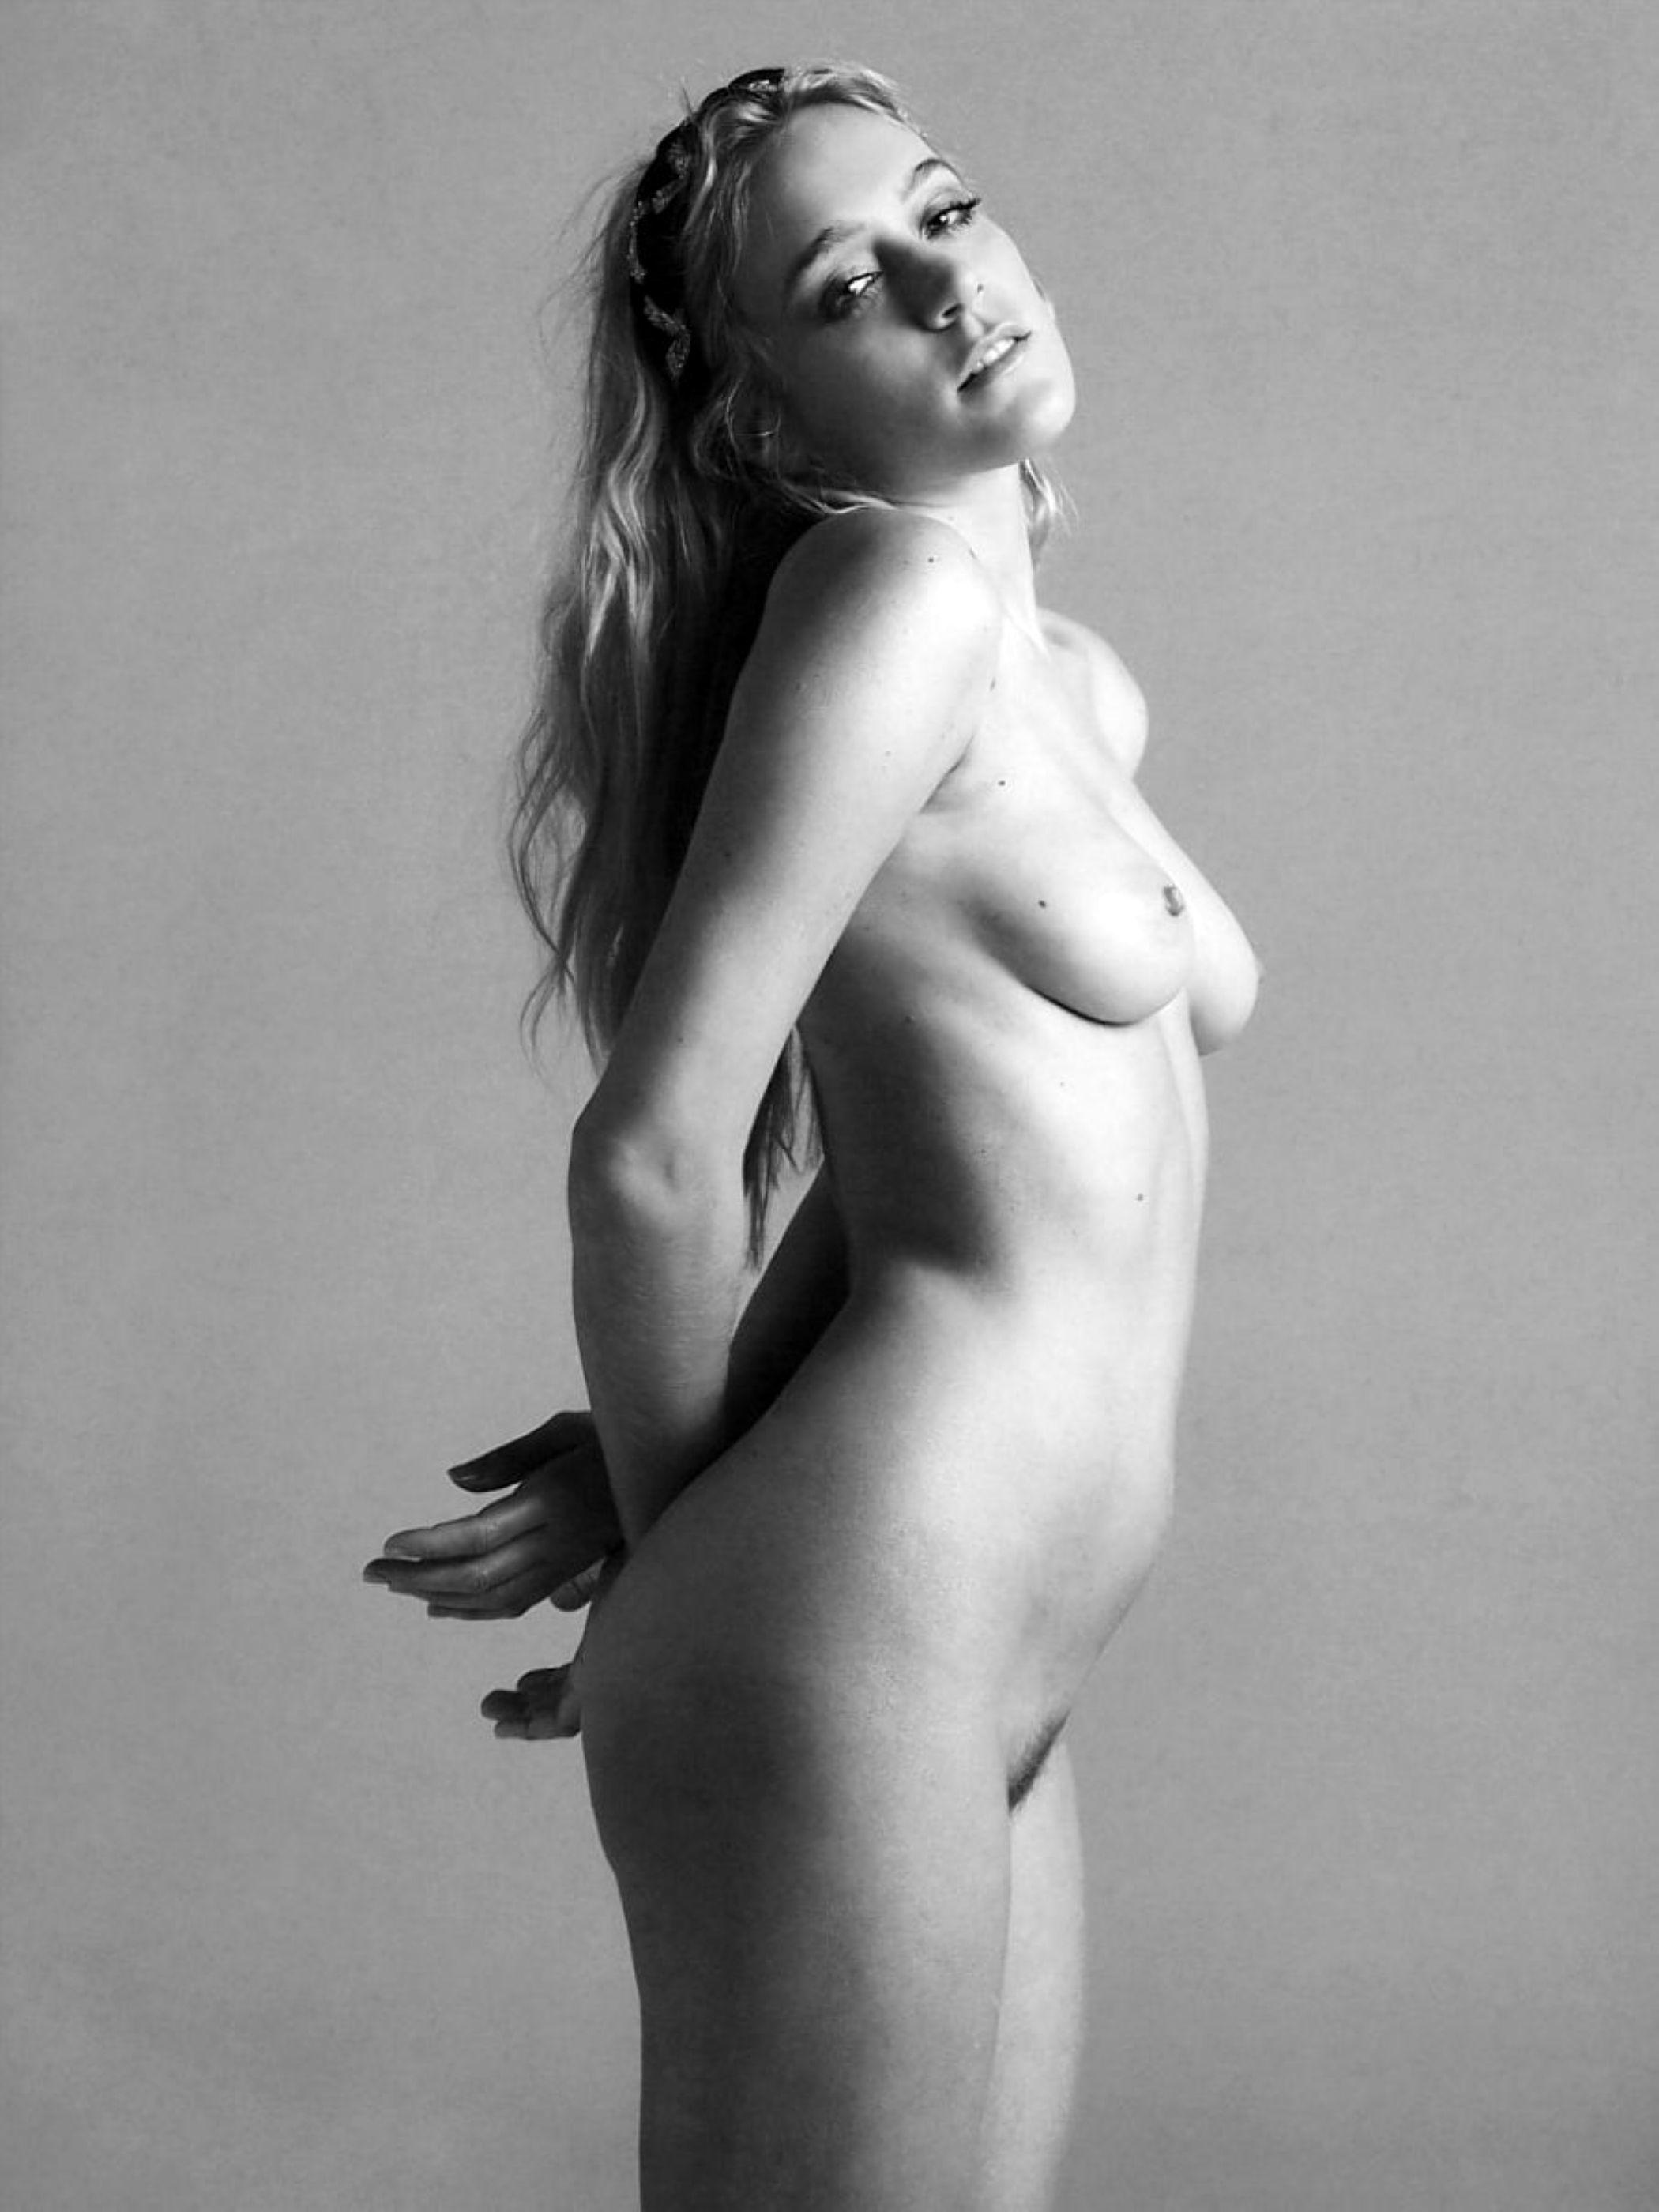 Chloe-Sevigny-Naked-3